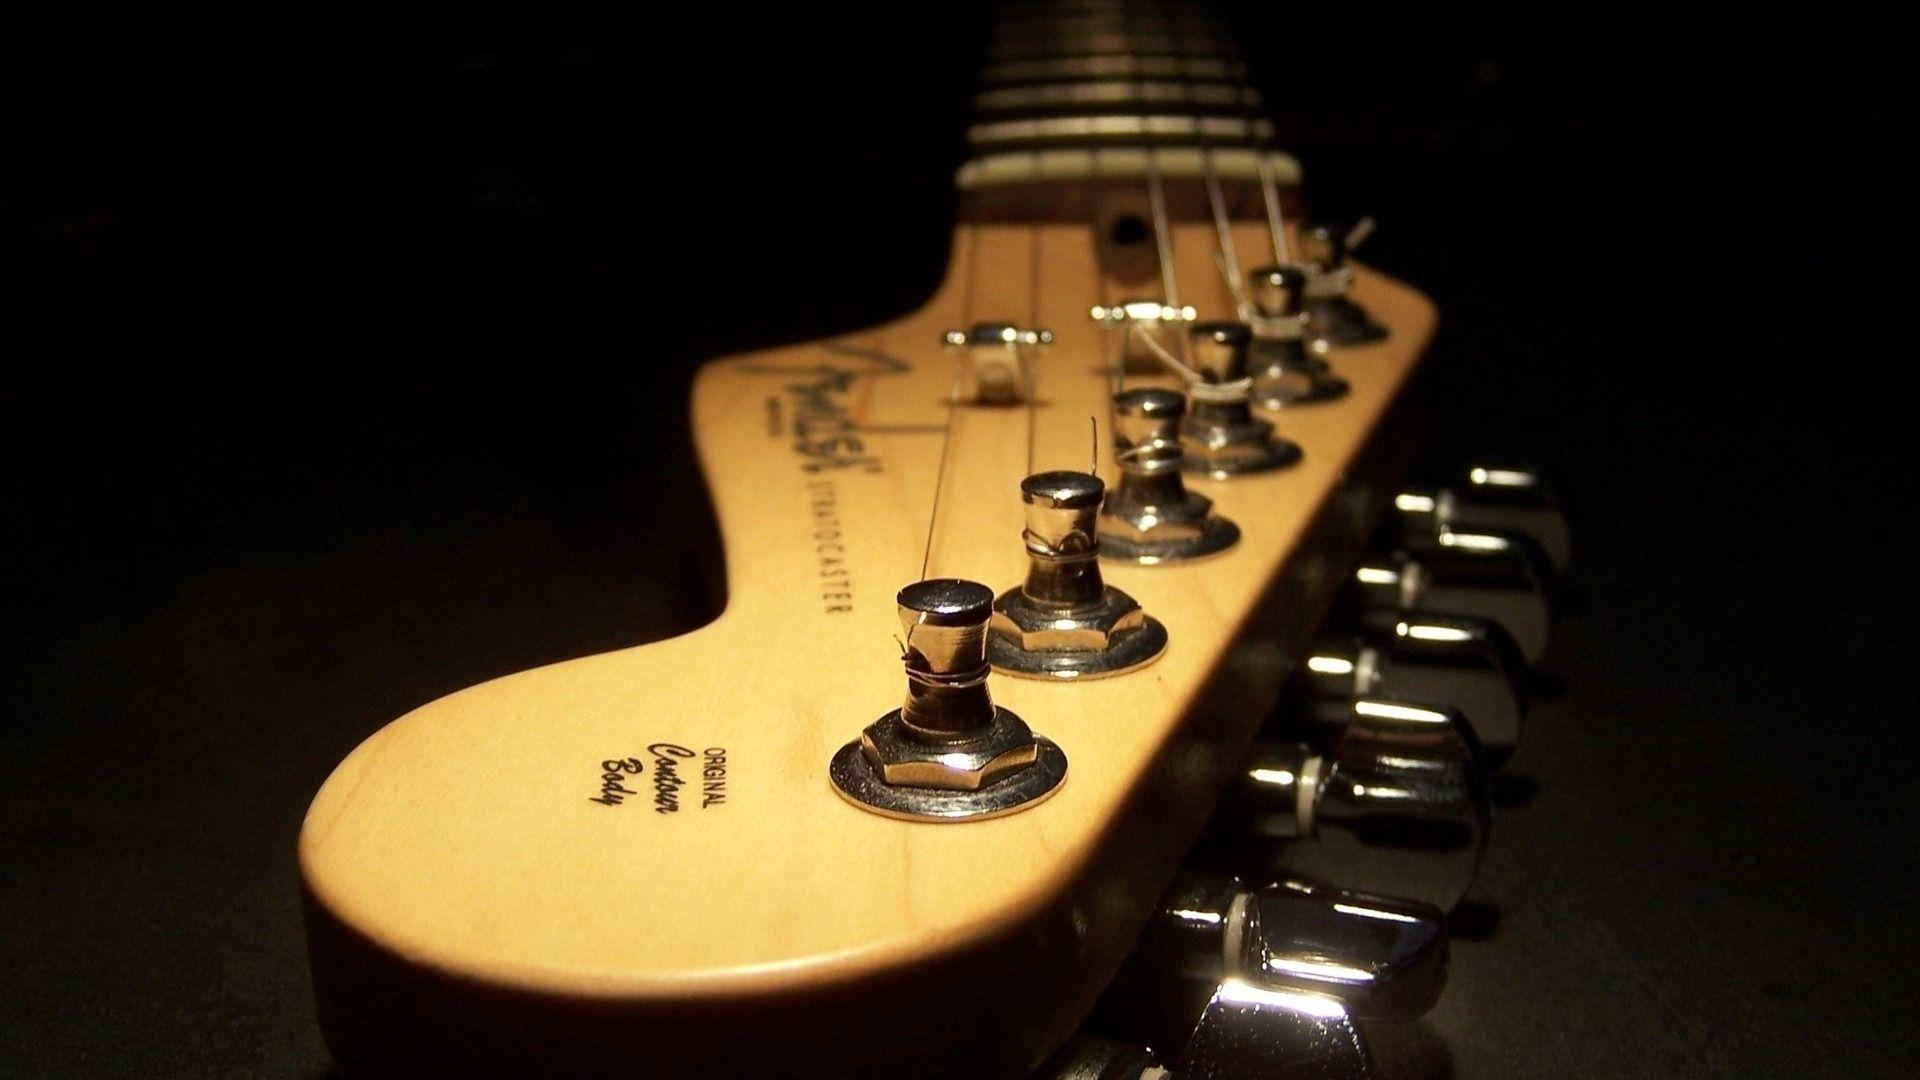 Fender Guitar, HD Desktop Wallpaper